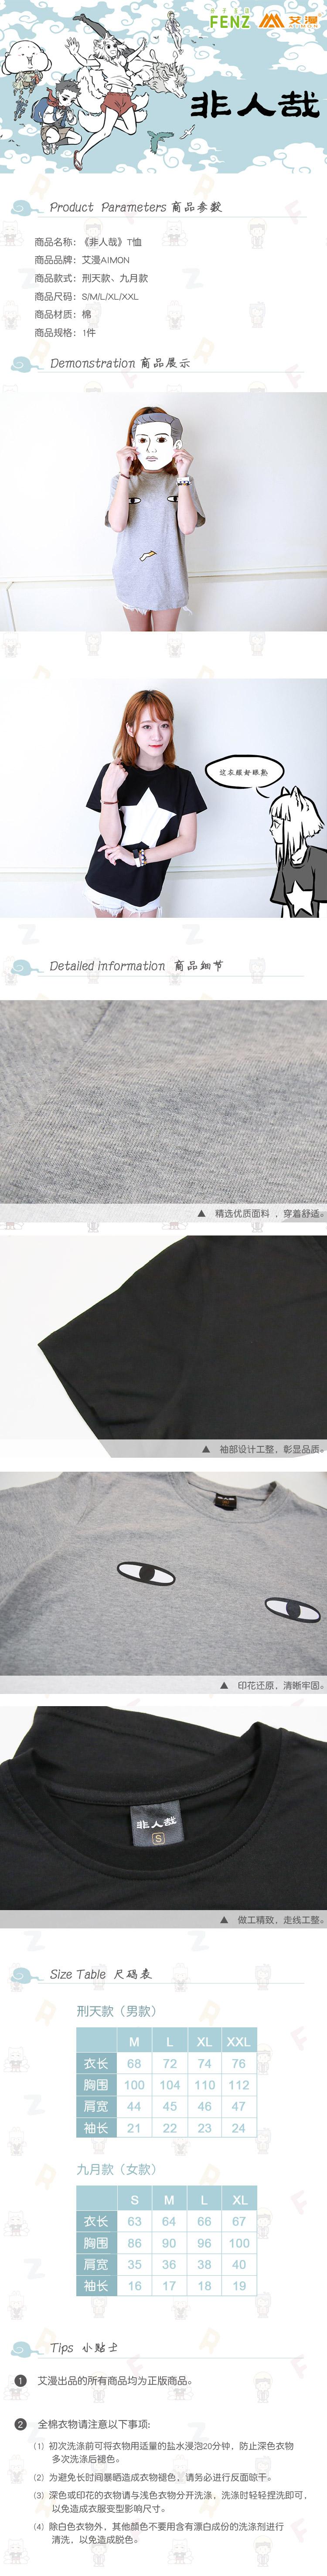 1529401732510非人哉-T恤条图.jpg